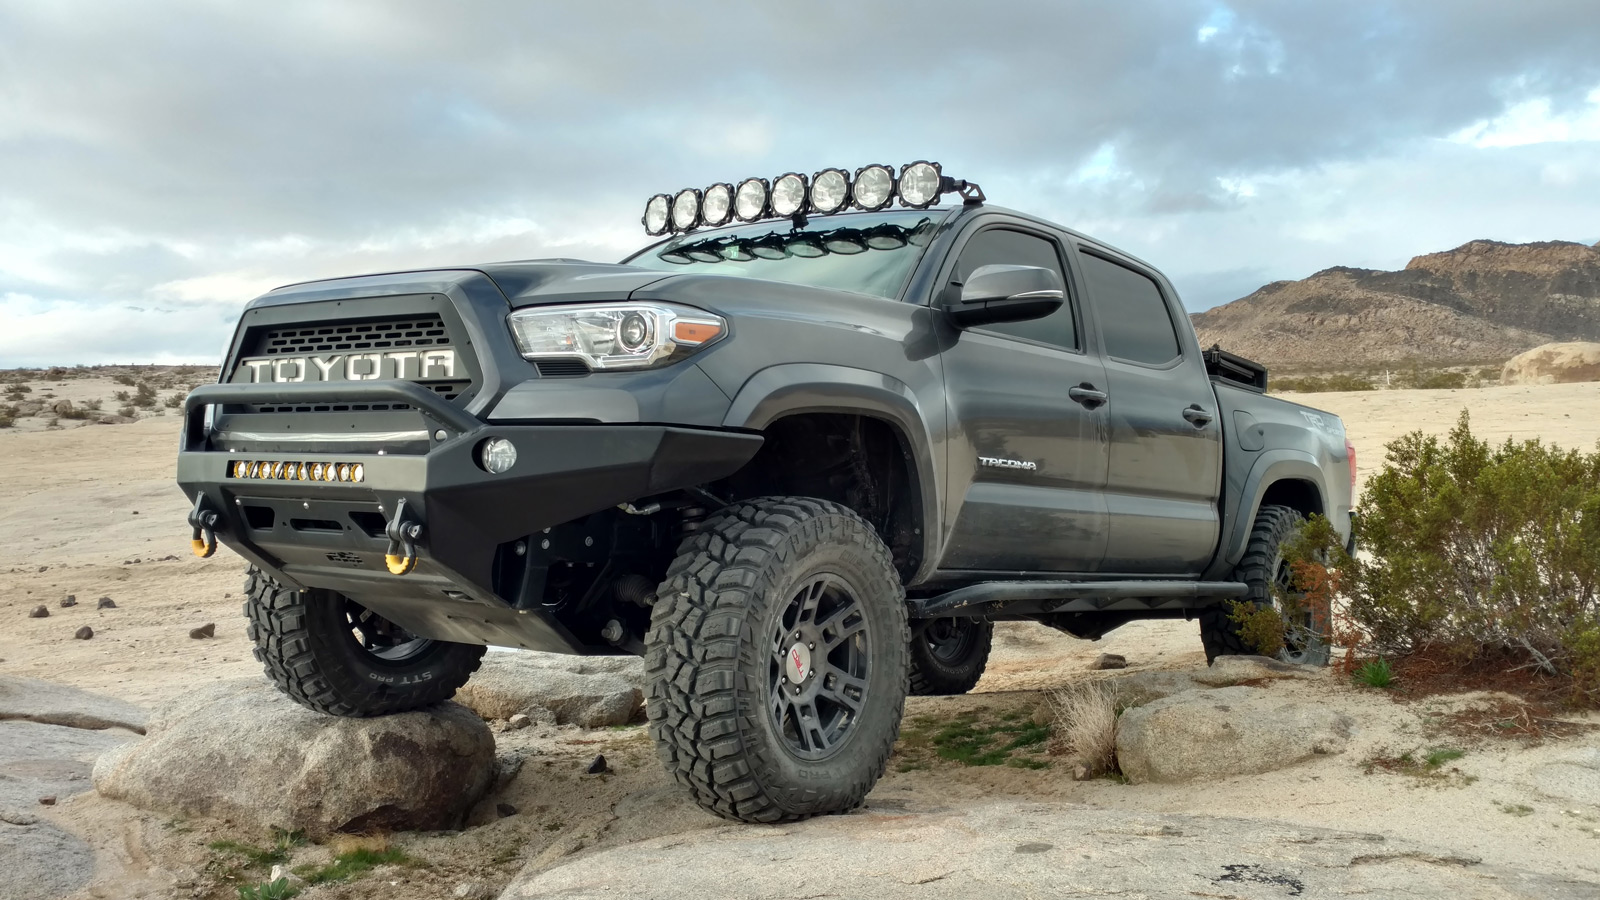 Custom Off Road Desert Stormer Toyota Tacoma - Image #02